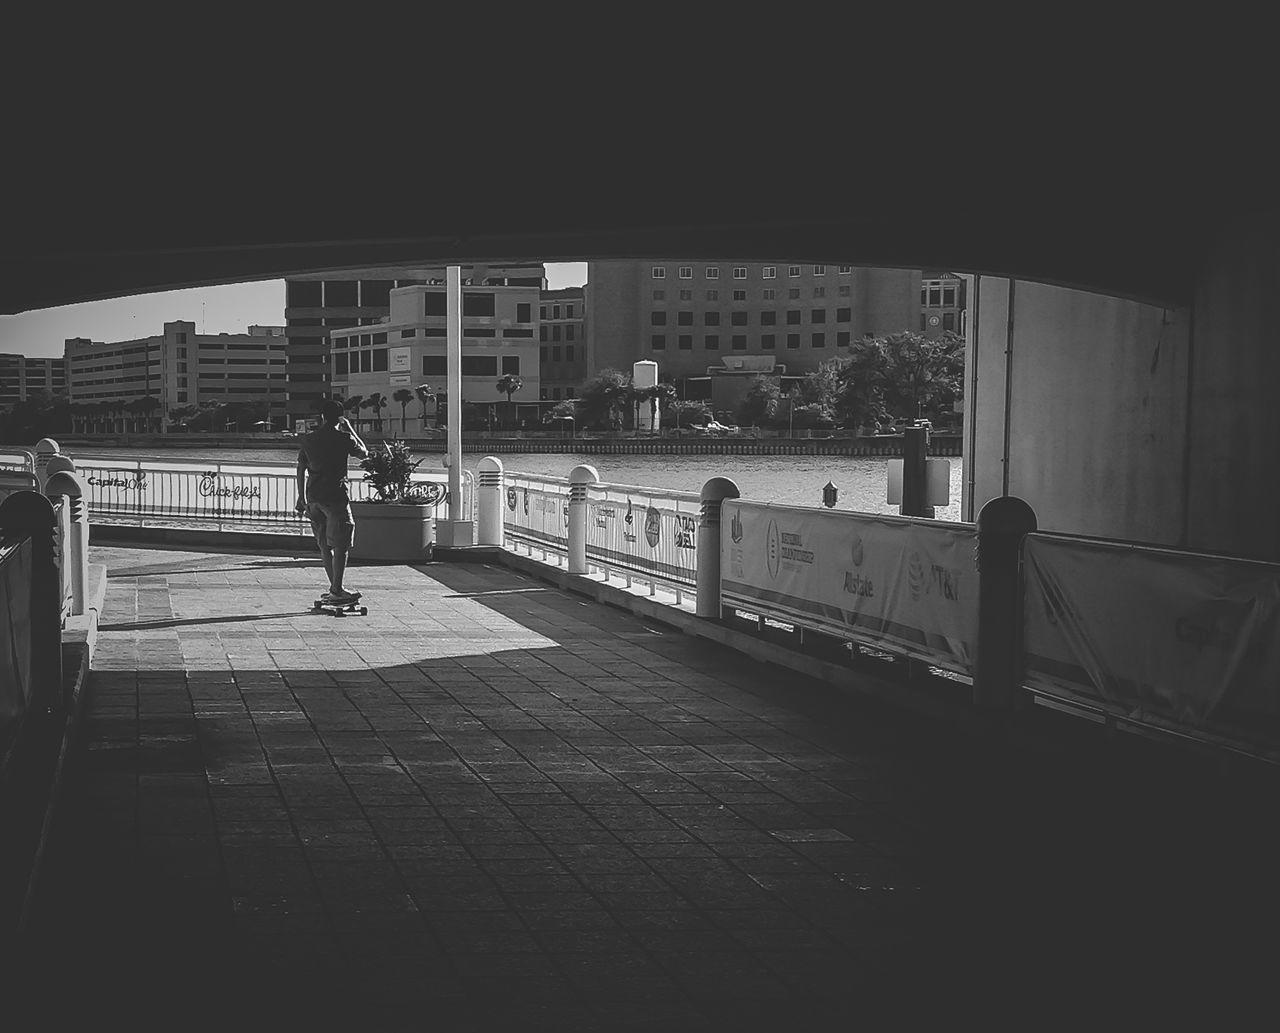 Black & White Black And White Blackandwhite Photography IPhone IPhone Photography IPhoneography Street Photography Streetphoto_bw Streetphotography